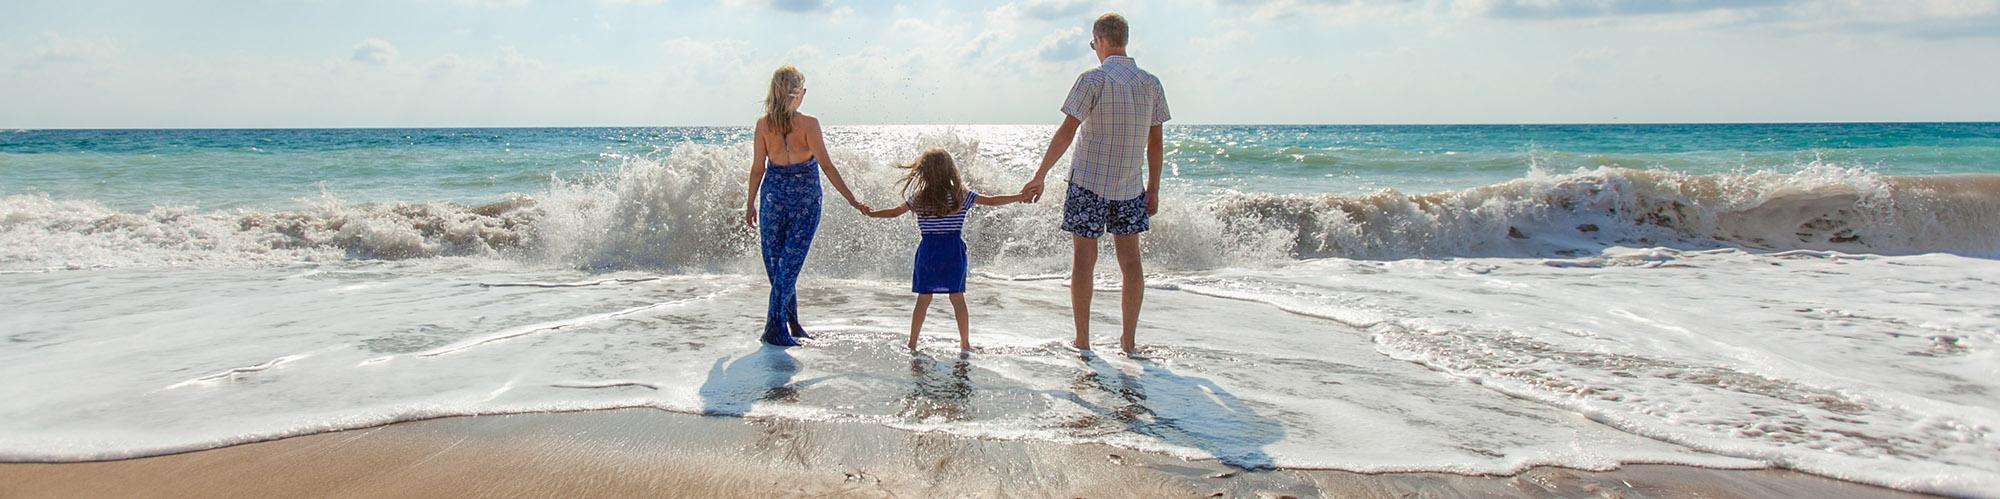 Voyage en famille au Sri Lanka